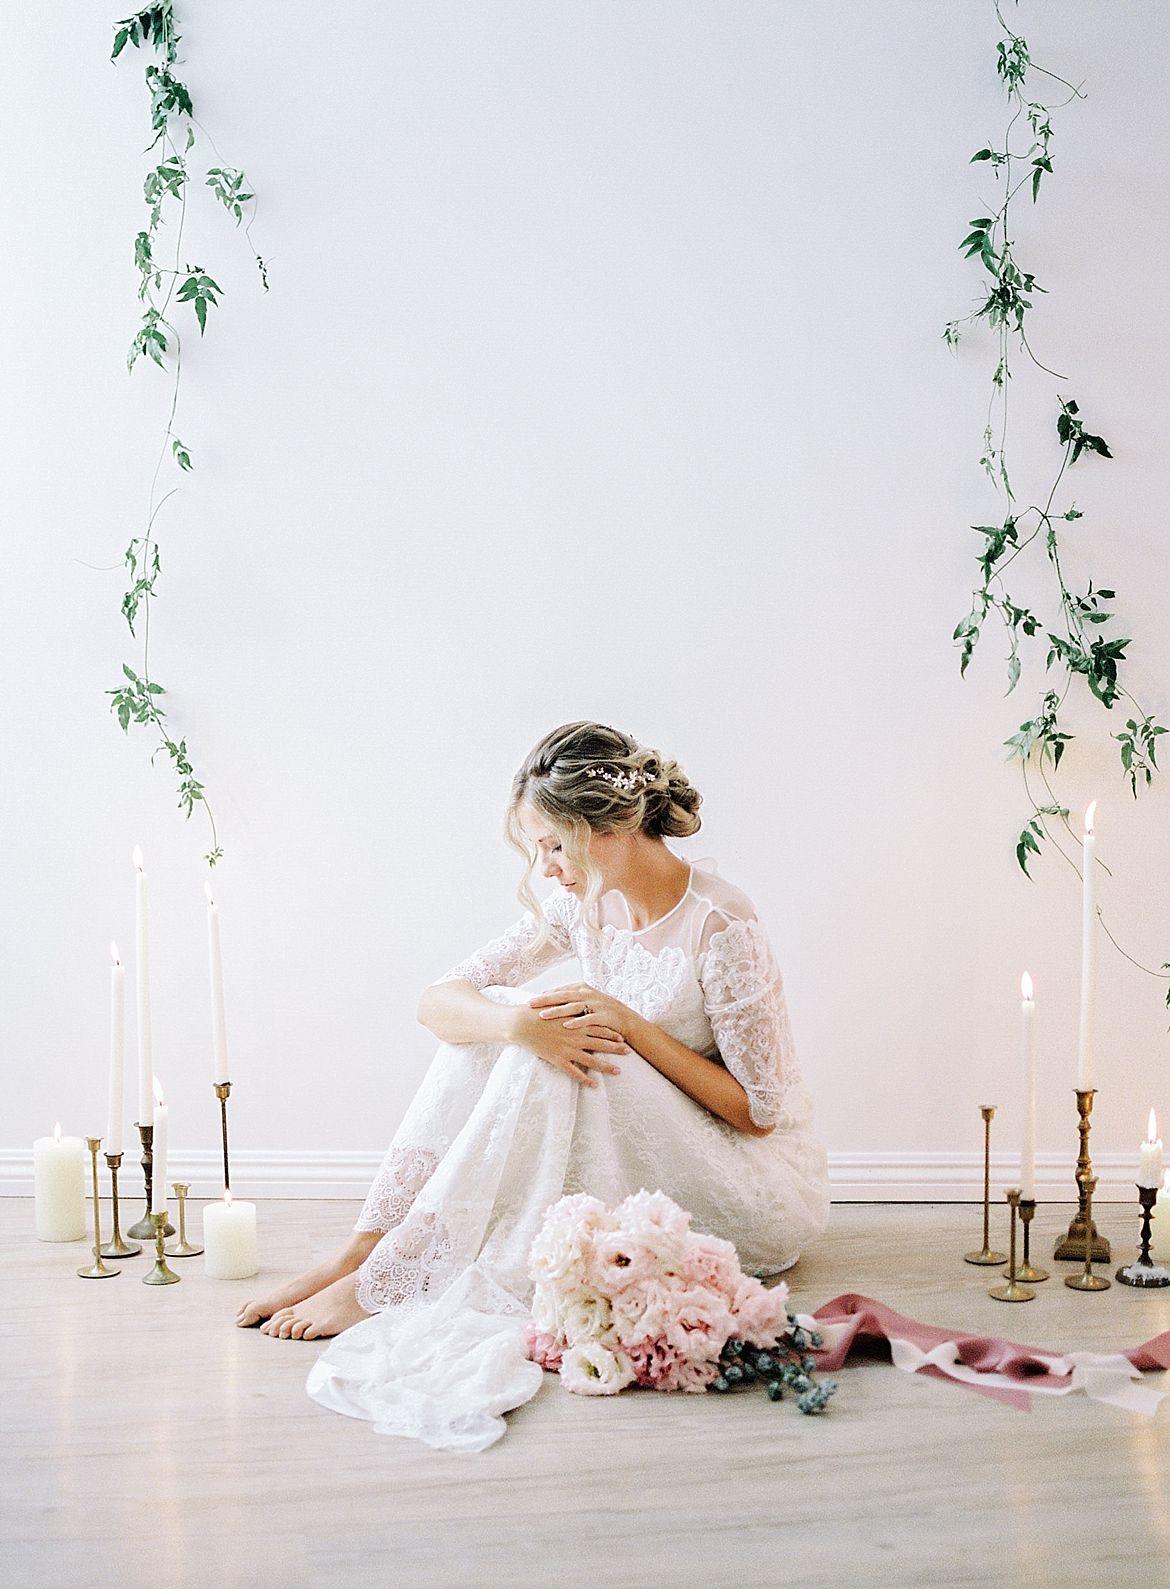 Vintage European Bridal Inspiration